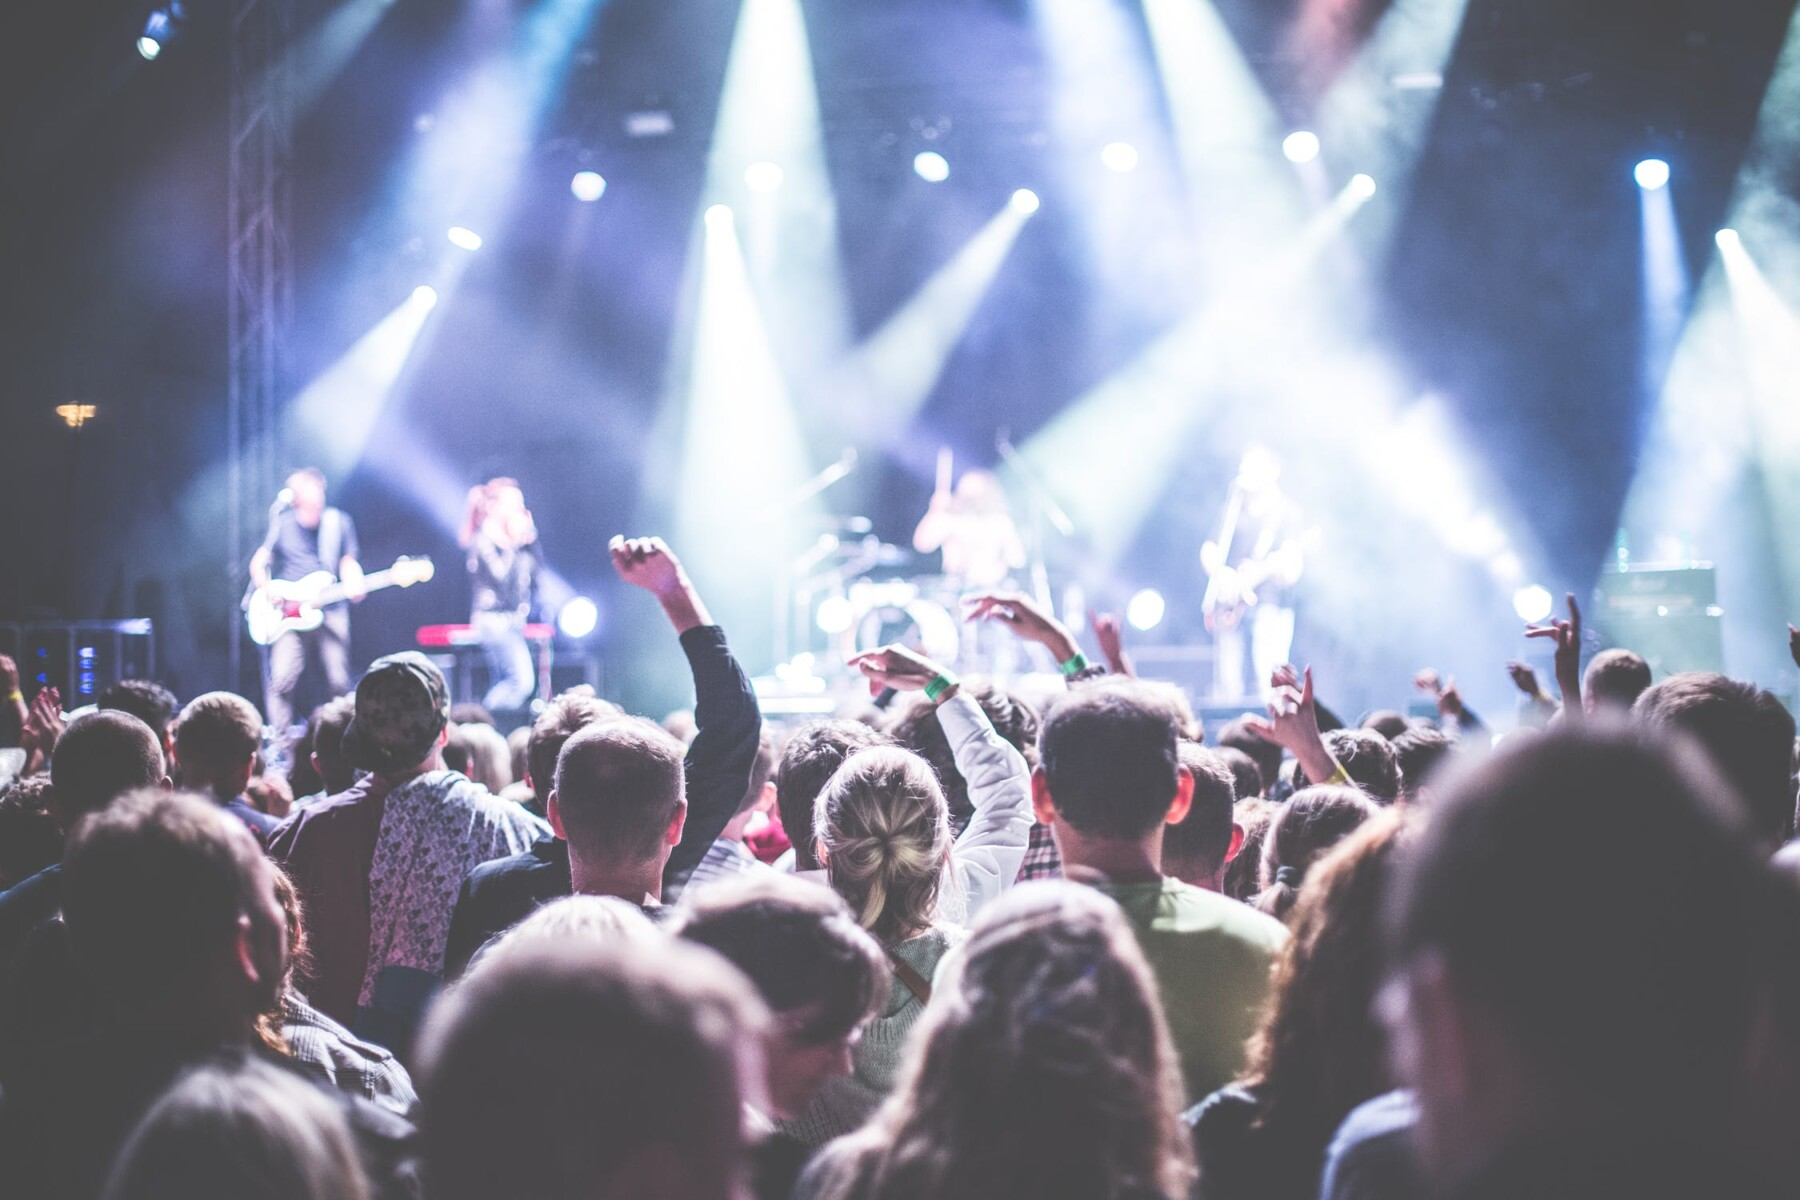 Smart Tickets: Creators Capturing Secondary Market Sales - The Big Picture